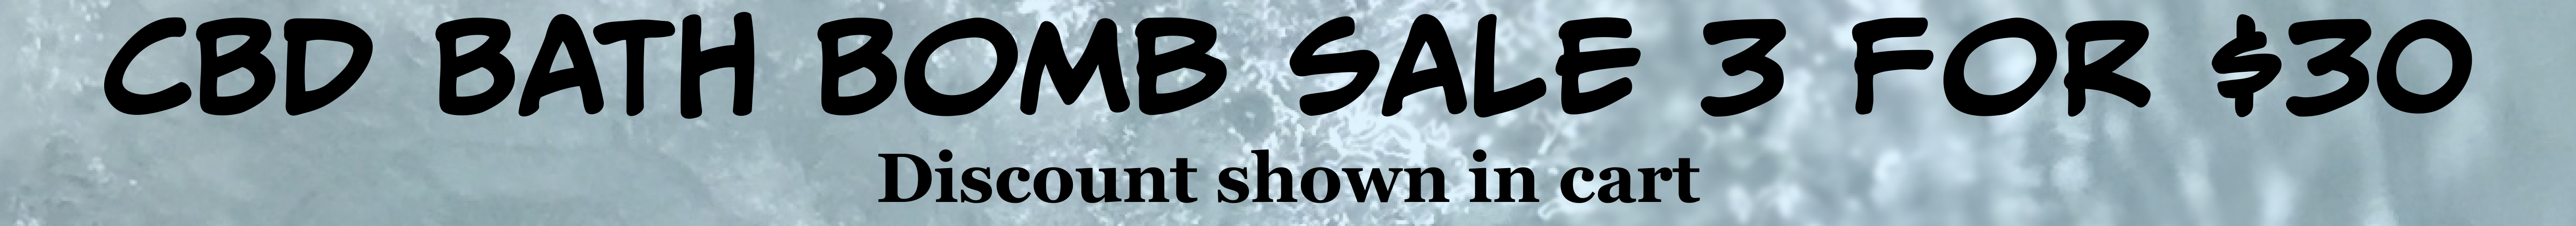 cbd-website-page-banner.jpg